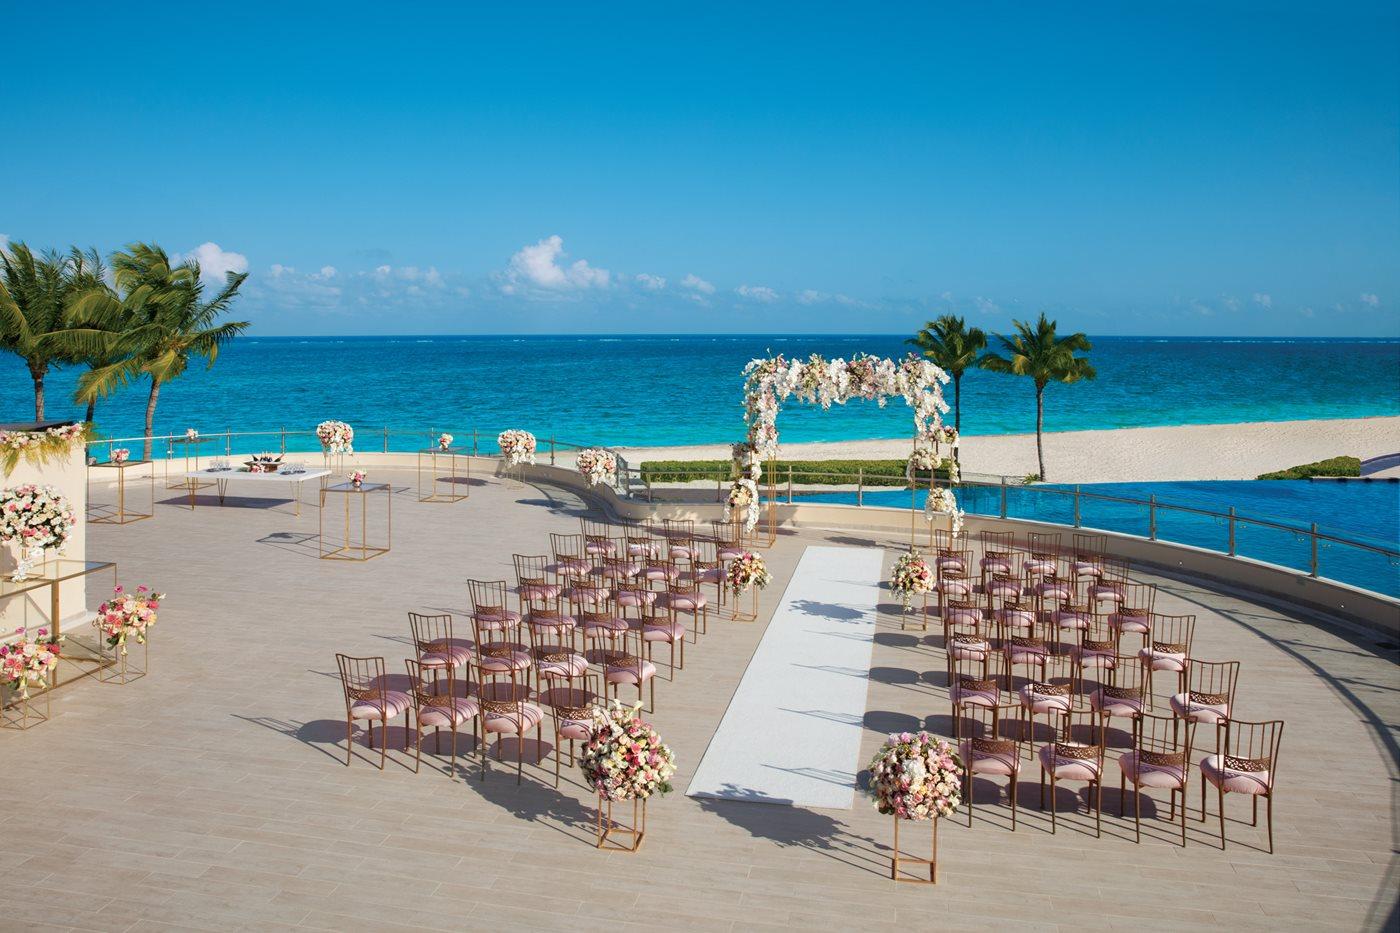 Dreams Riviera Cancun Resort and Spa - Riviera Maya | Transat on